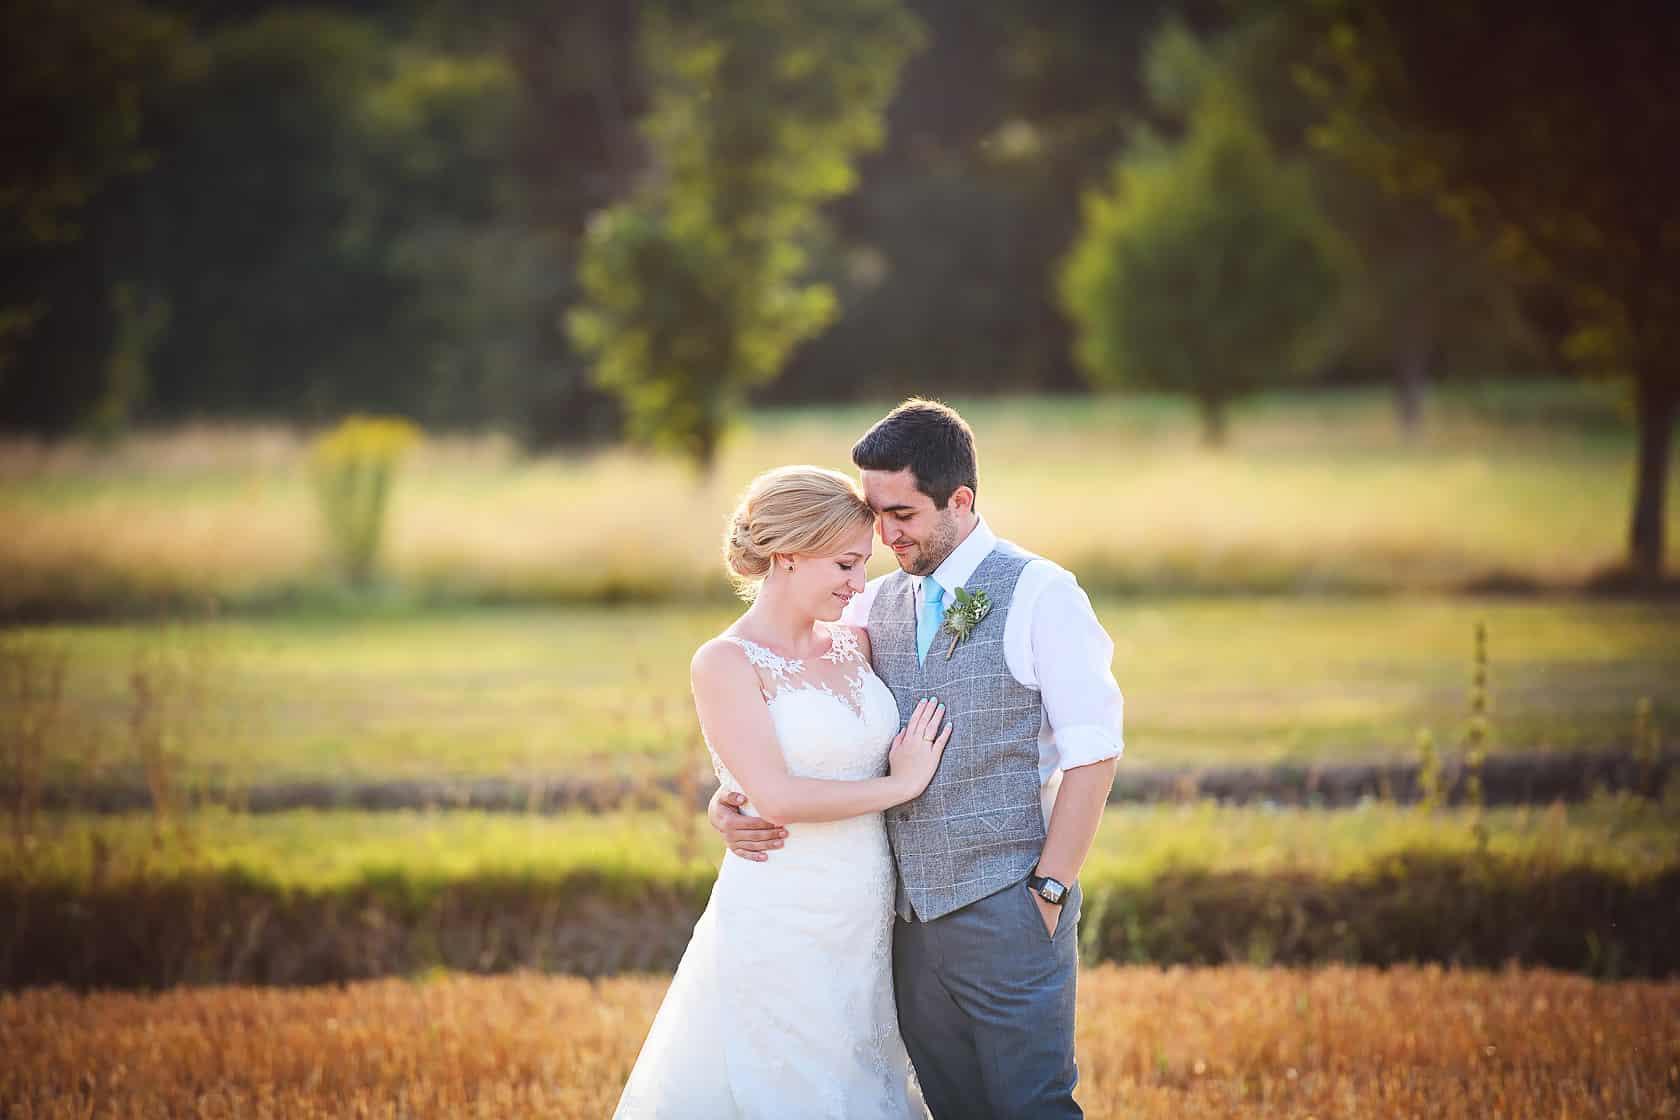 Best_Wedding_Photography_2018_Wedding-Photographer-Essex-and-London_035